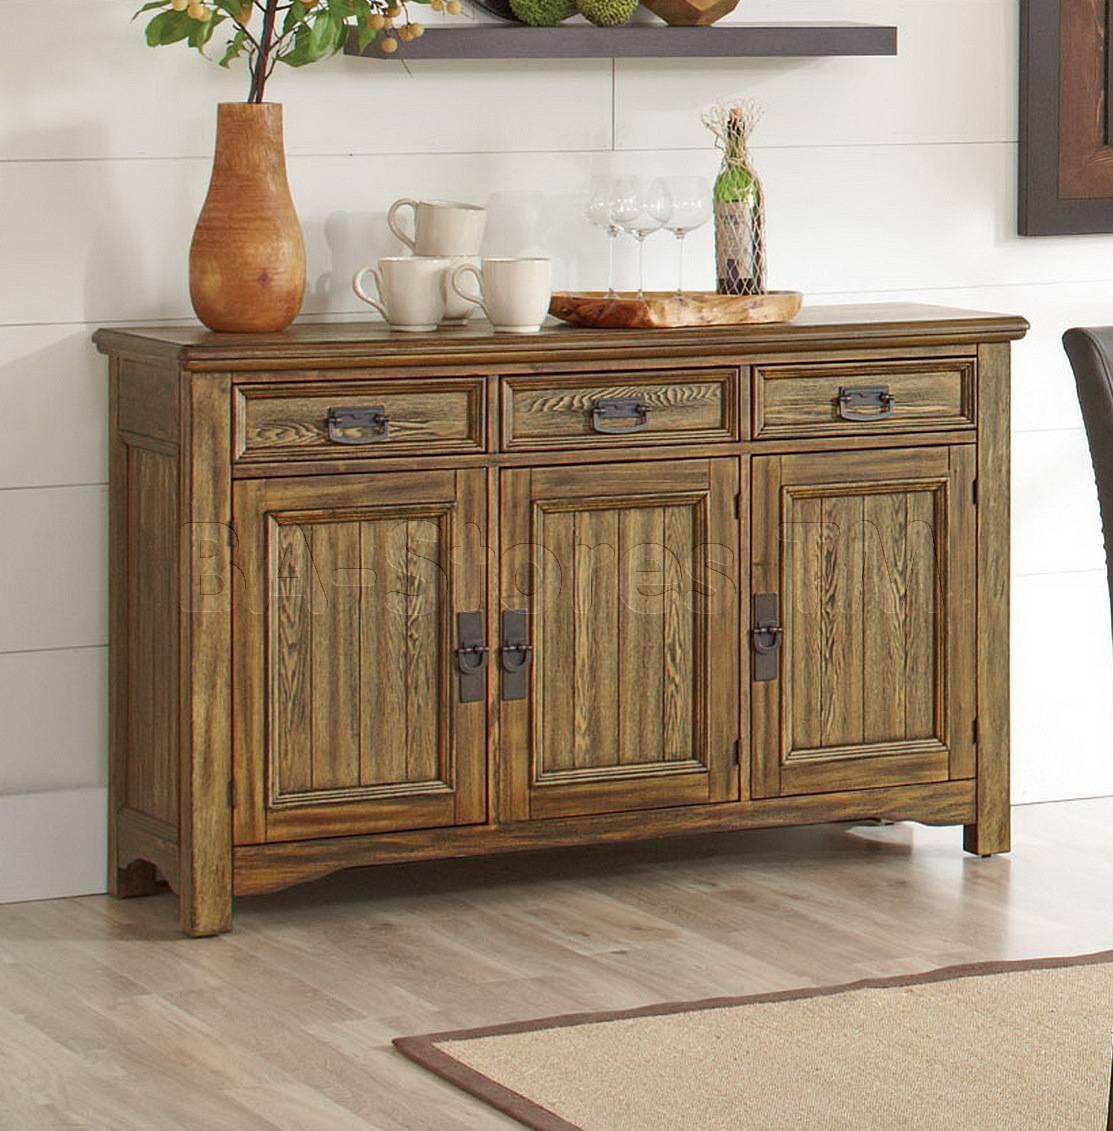 Decor: Rustic Oak Sideboard And Rustic Sideboard Inside Rustic Sideboards (View 6 of 20)